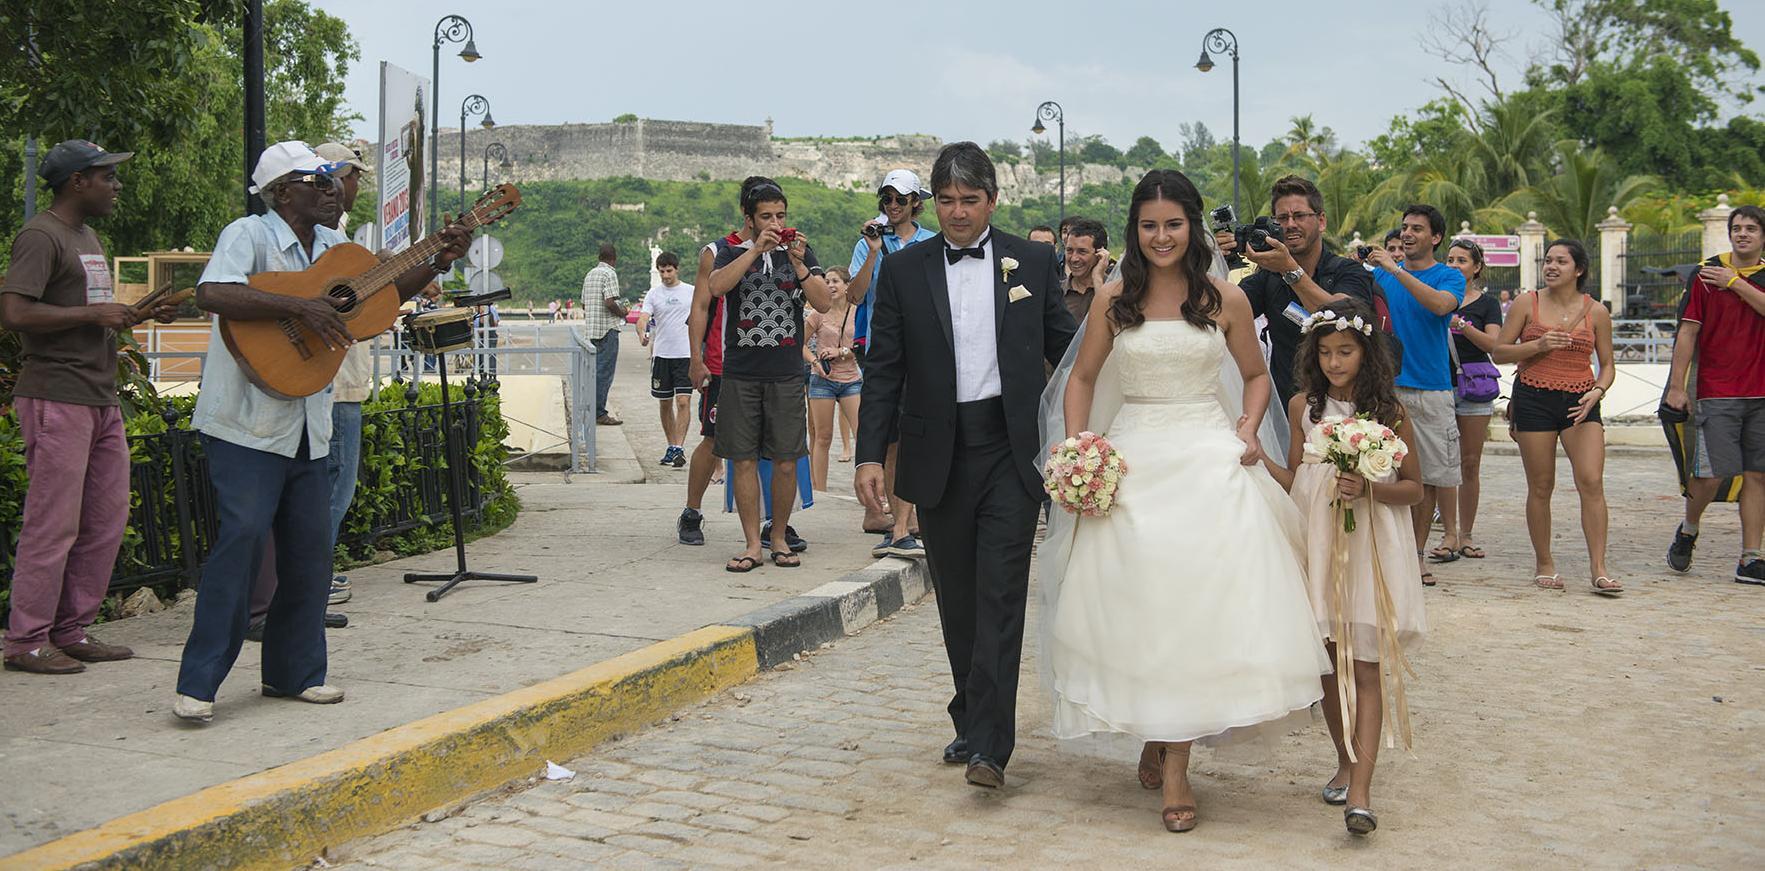 bodas-sin-clasificar-sin-tema-cuba-14782.jpg